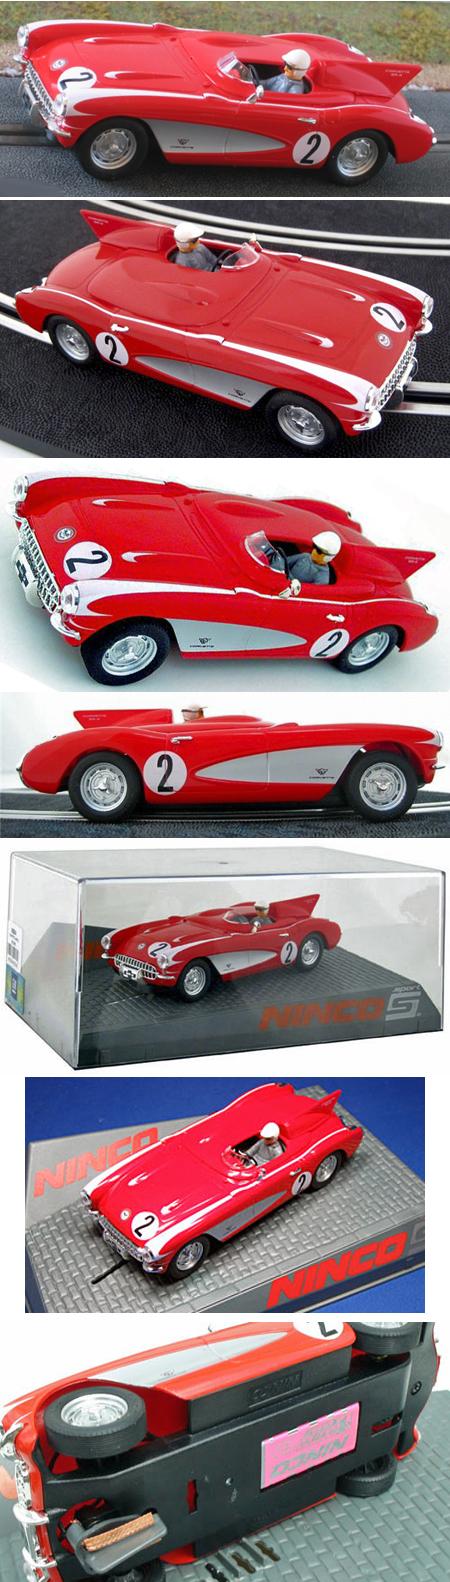 Ninco 50584 Corvette